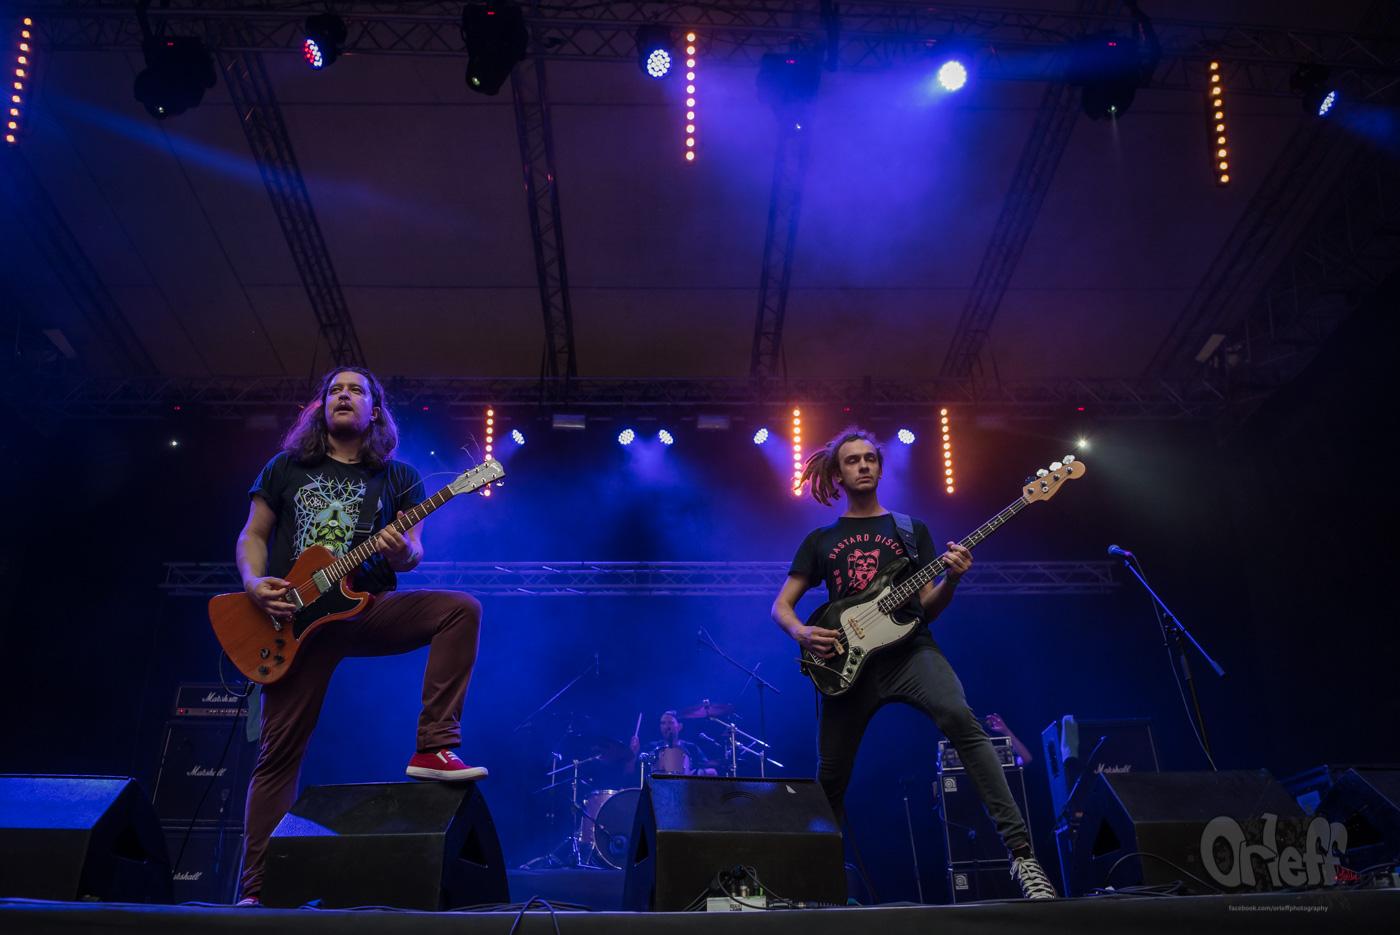 Stoned Jesus @ MetalDays Festival 2019